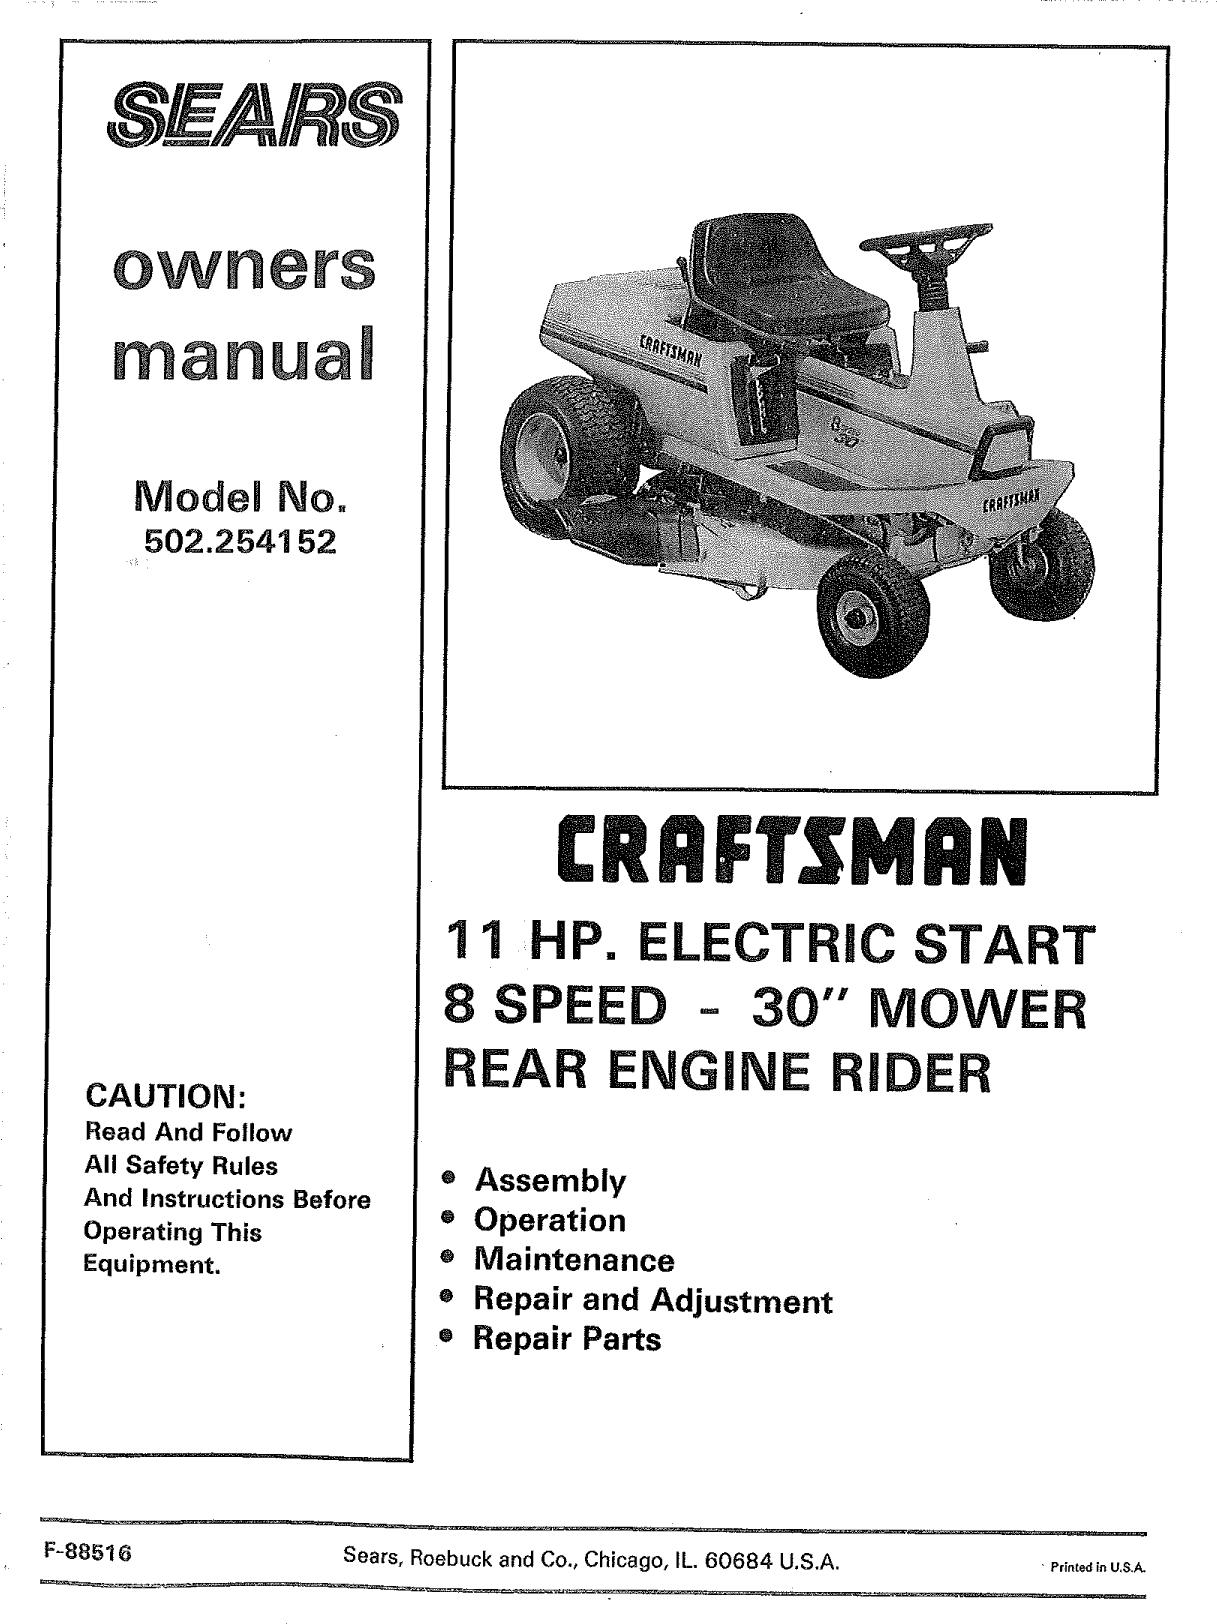 Craftsman 502254152 User Manual 11 HP REAR ENGINE RIDER